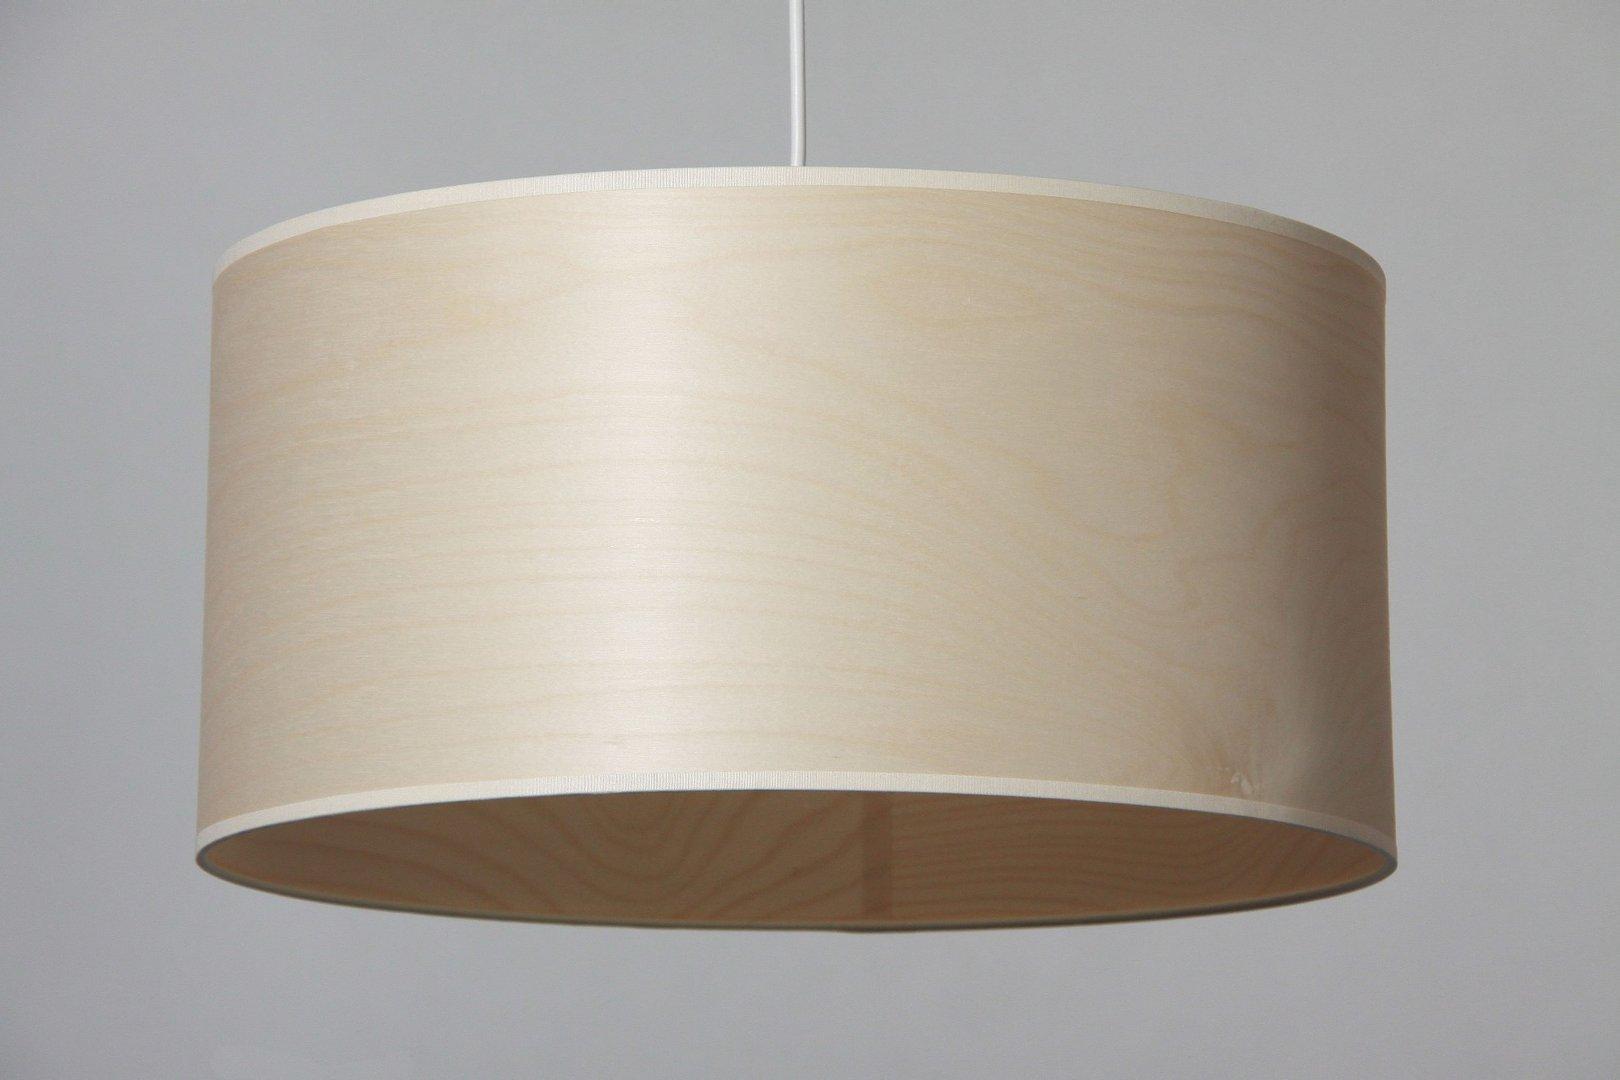 lampenschirm birke furnier leuchtenmanufaktur brodauf. Black Bedroom Furniture Sets. Home Design Ideas